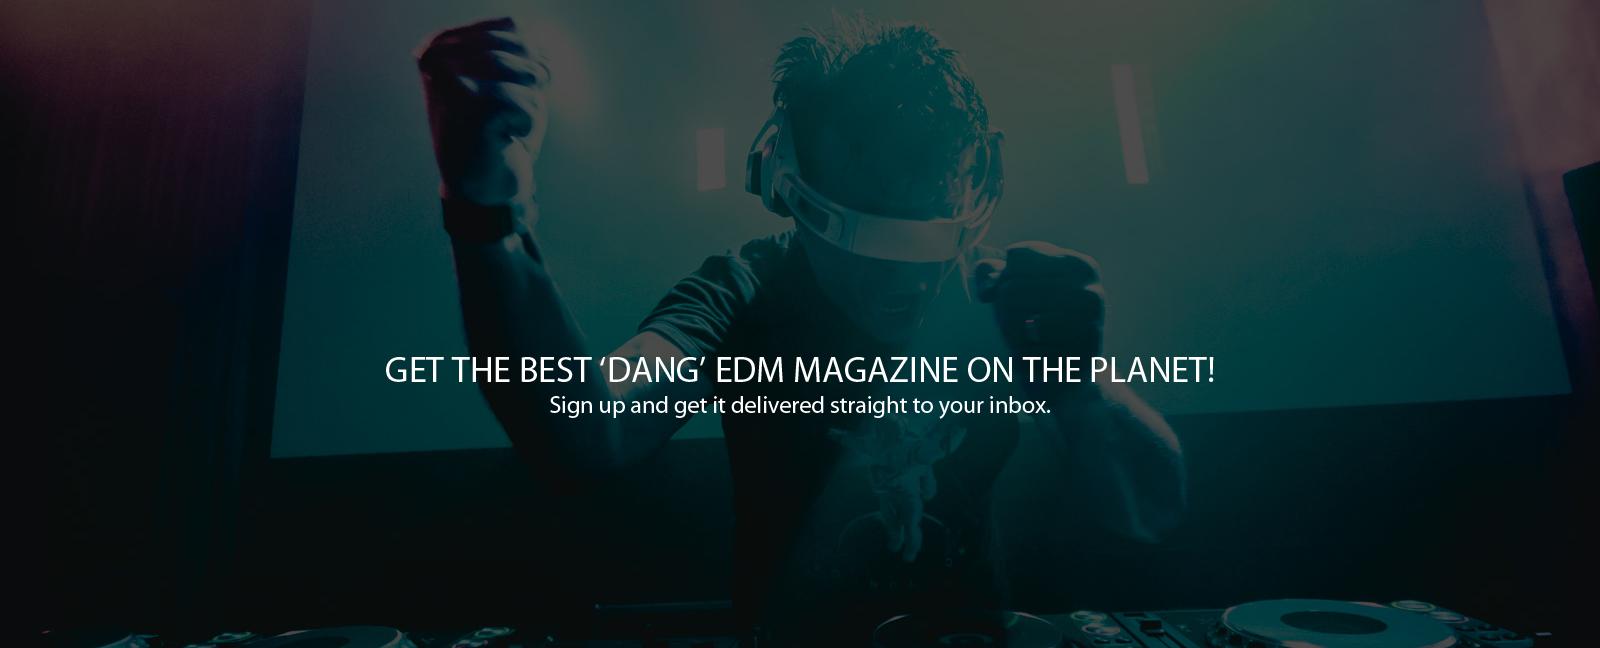 https://www.issuu.com/beatselectormagazine